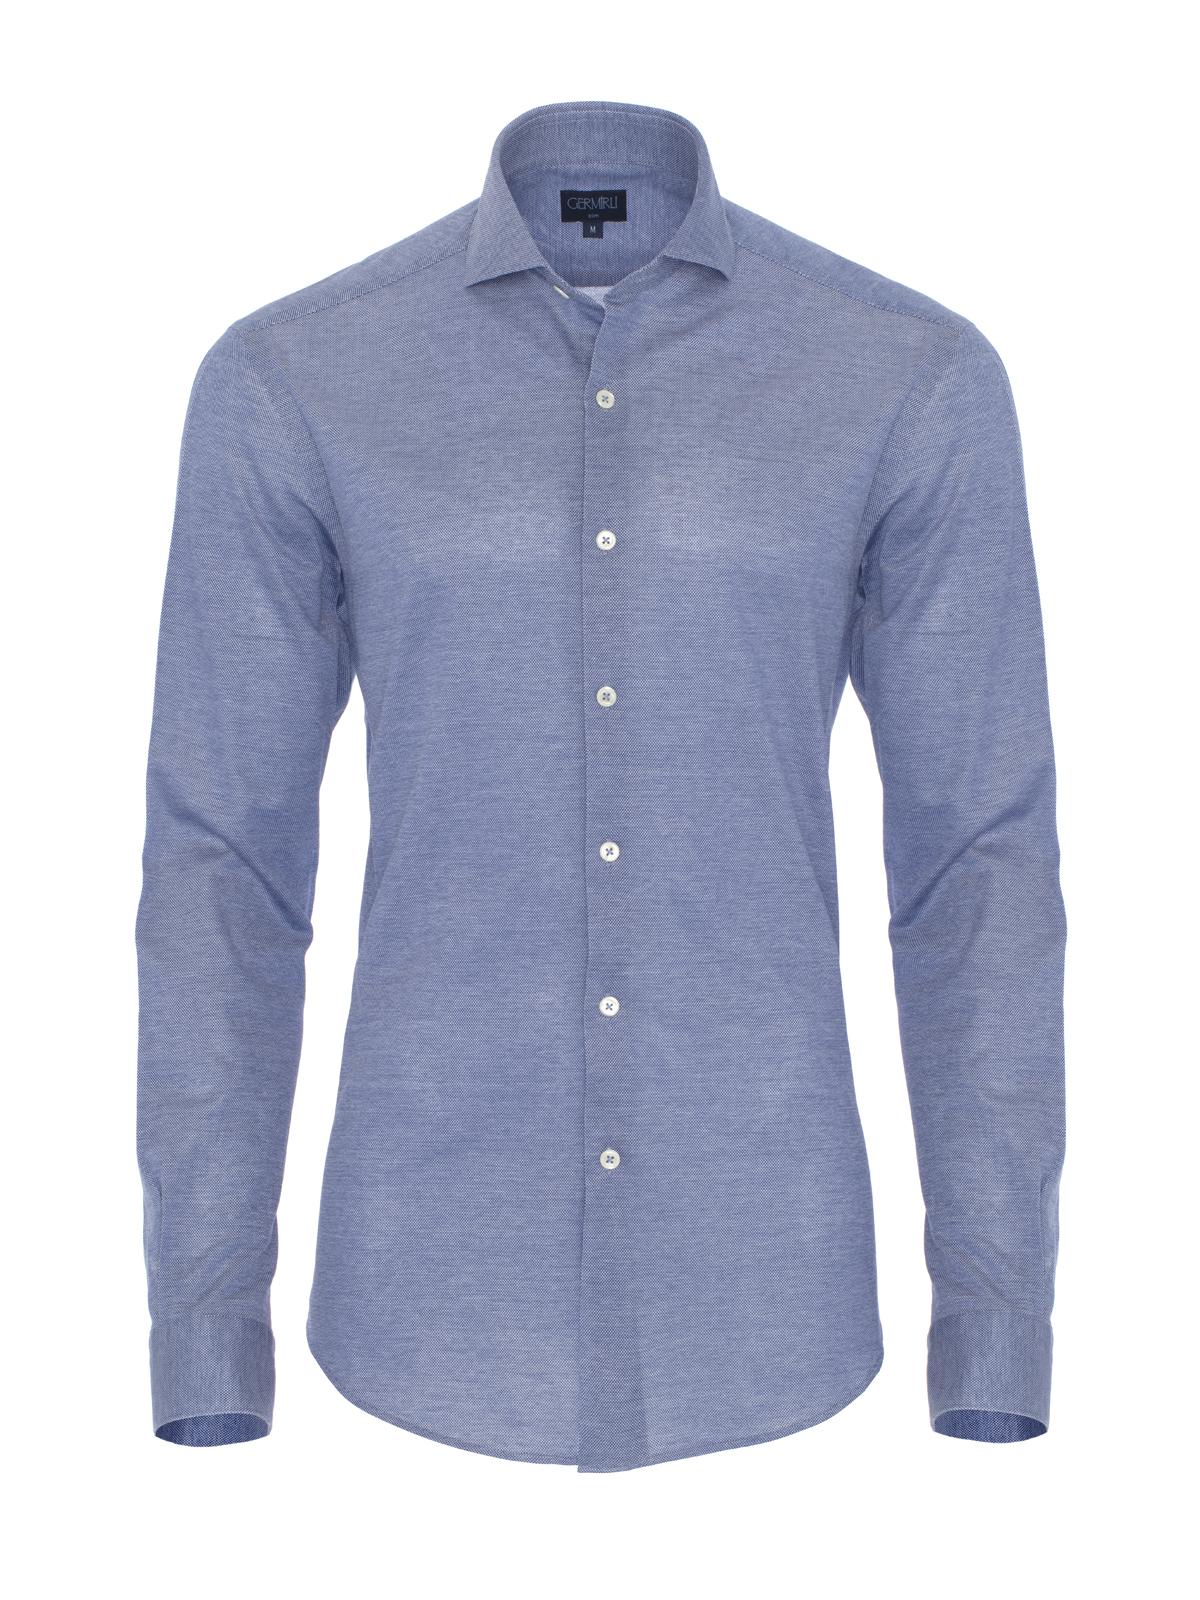 Germirli Koyu Mavi Klasik Yaka Piquet Örme Slim Fit Gömlek